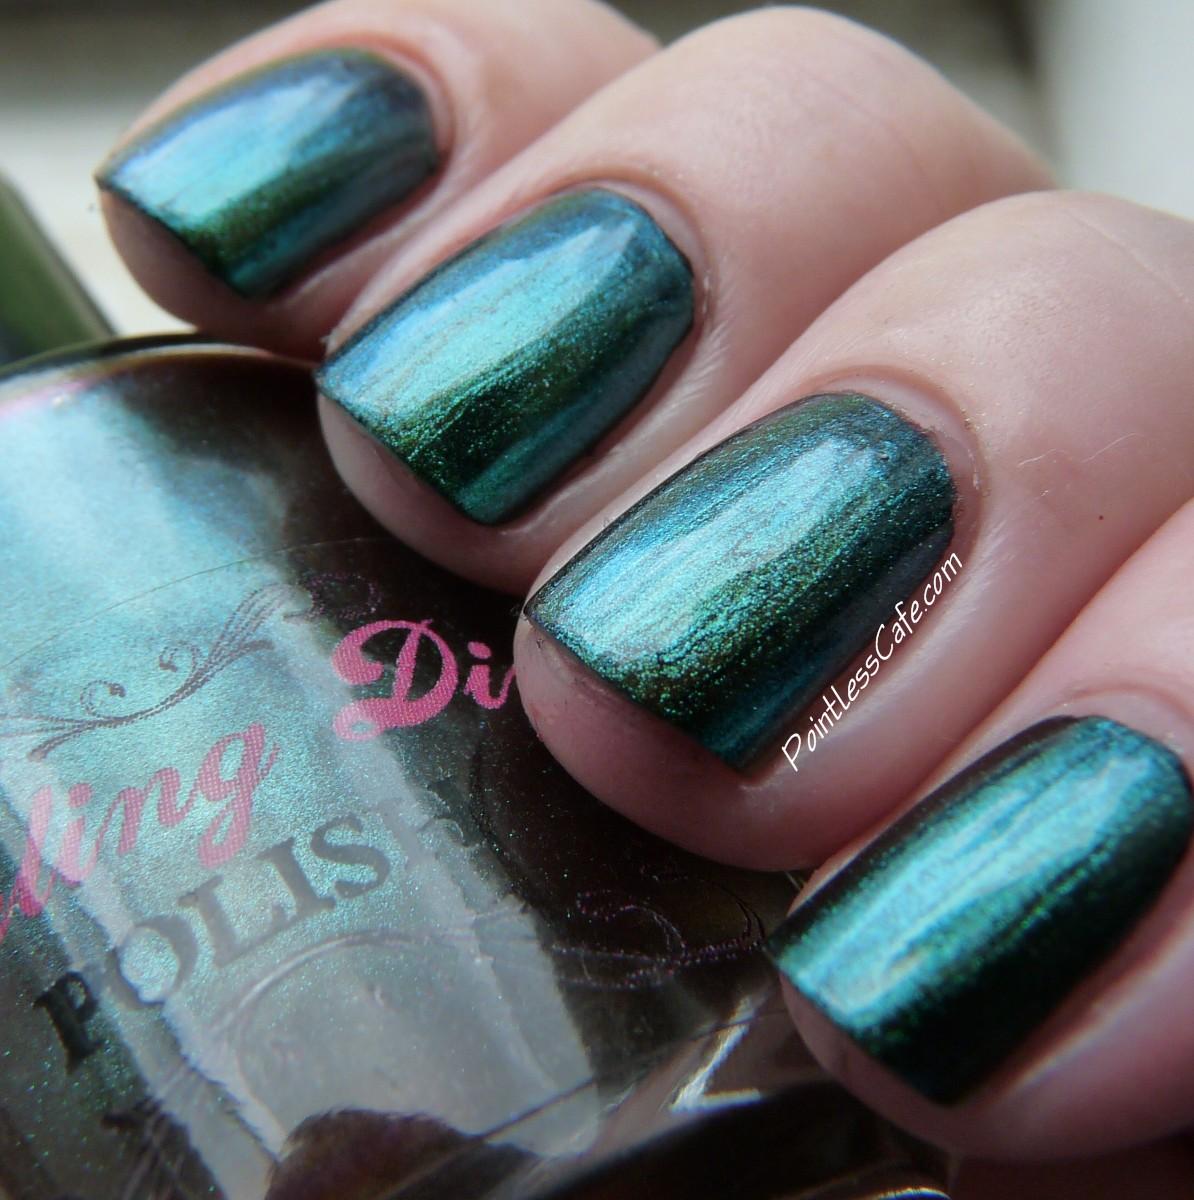 Darling Diva Polish - Bad Girl and Sakura   Pointless Cafe